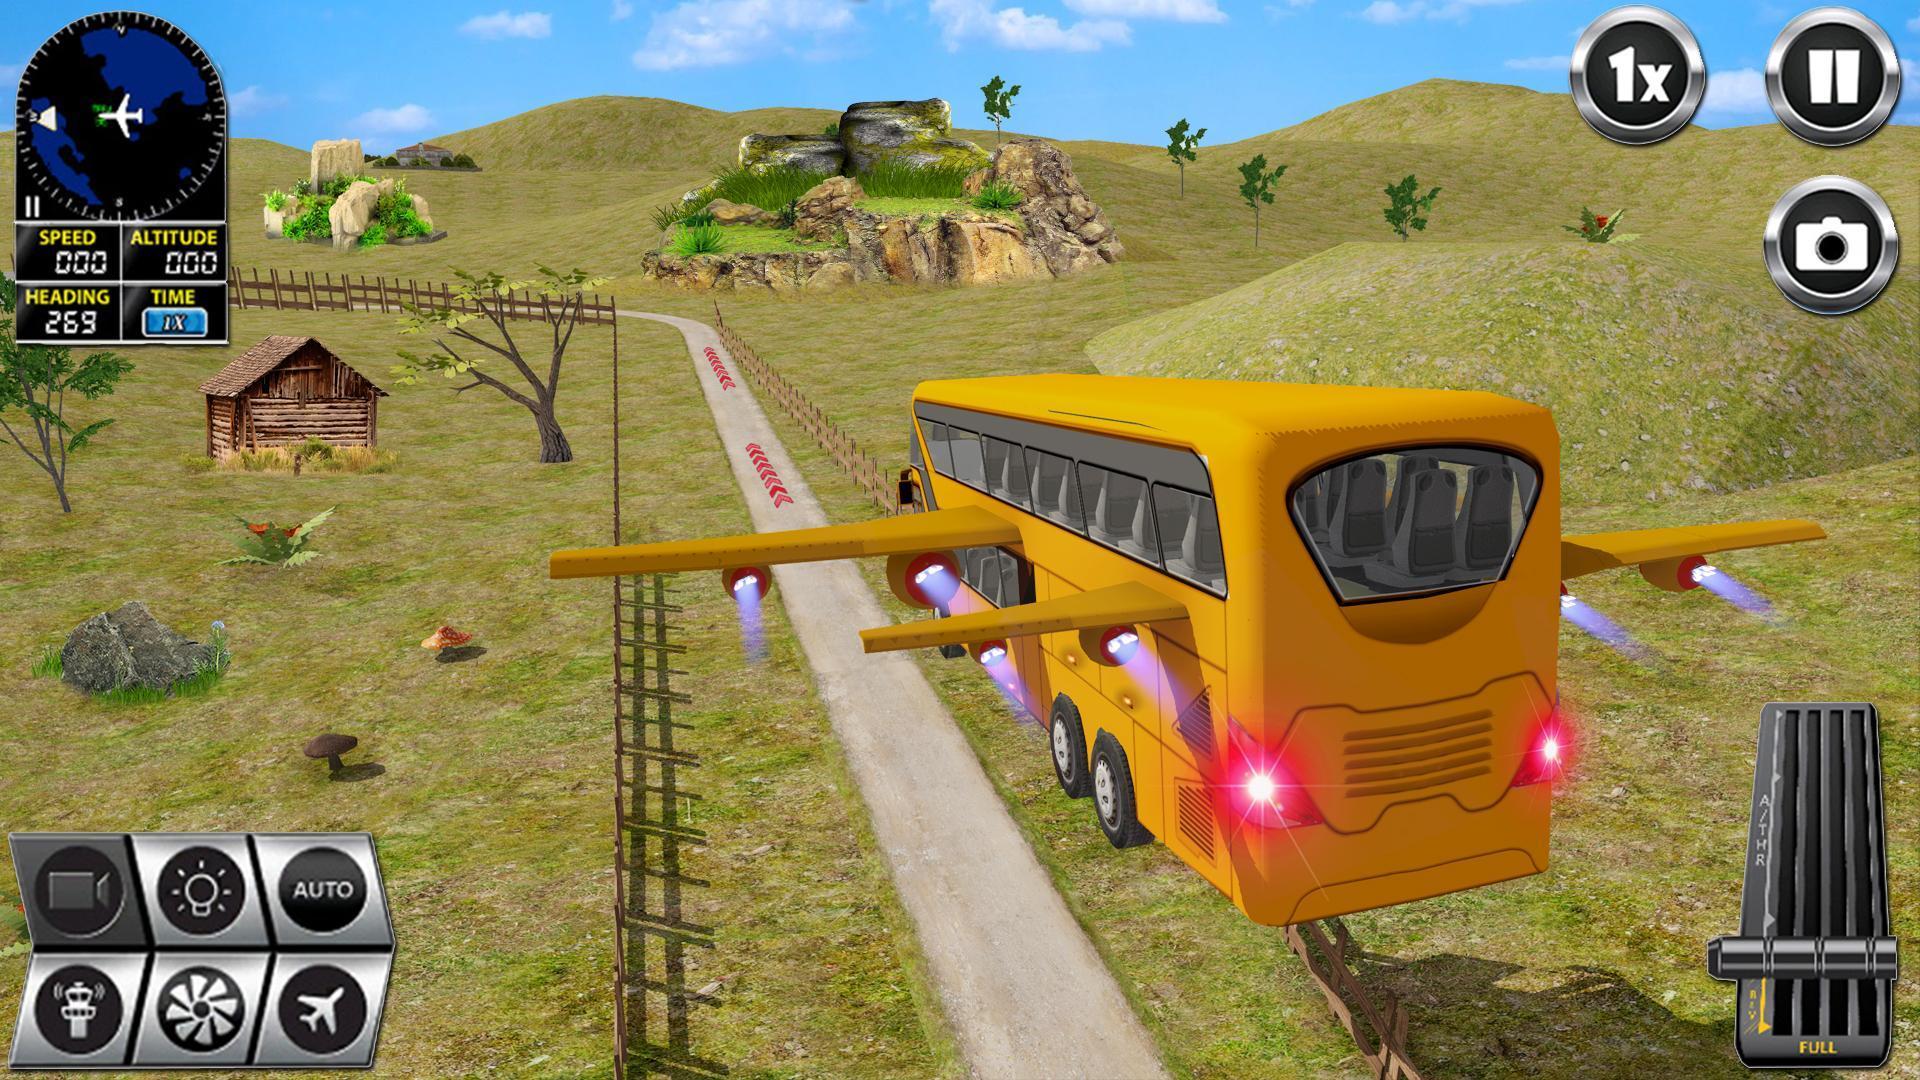 Flying Bus Driving simulator 2019: Free Bus Games 2.8 Screenshot 18